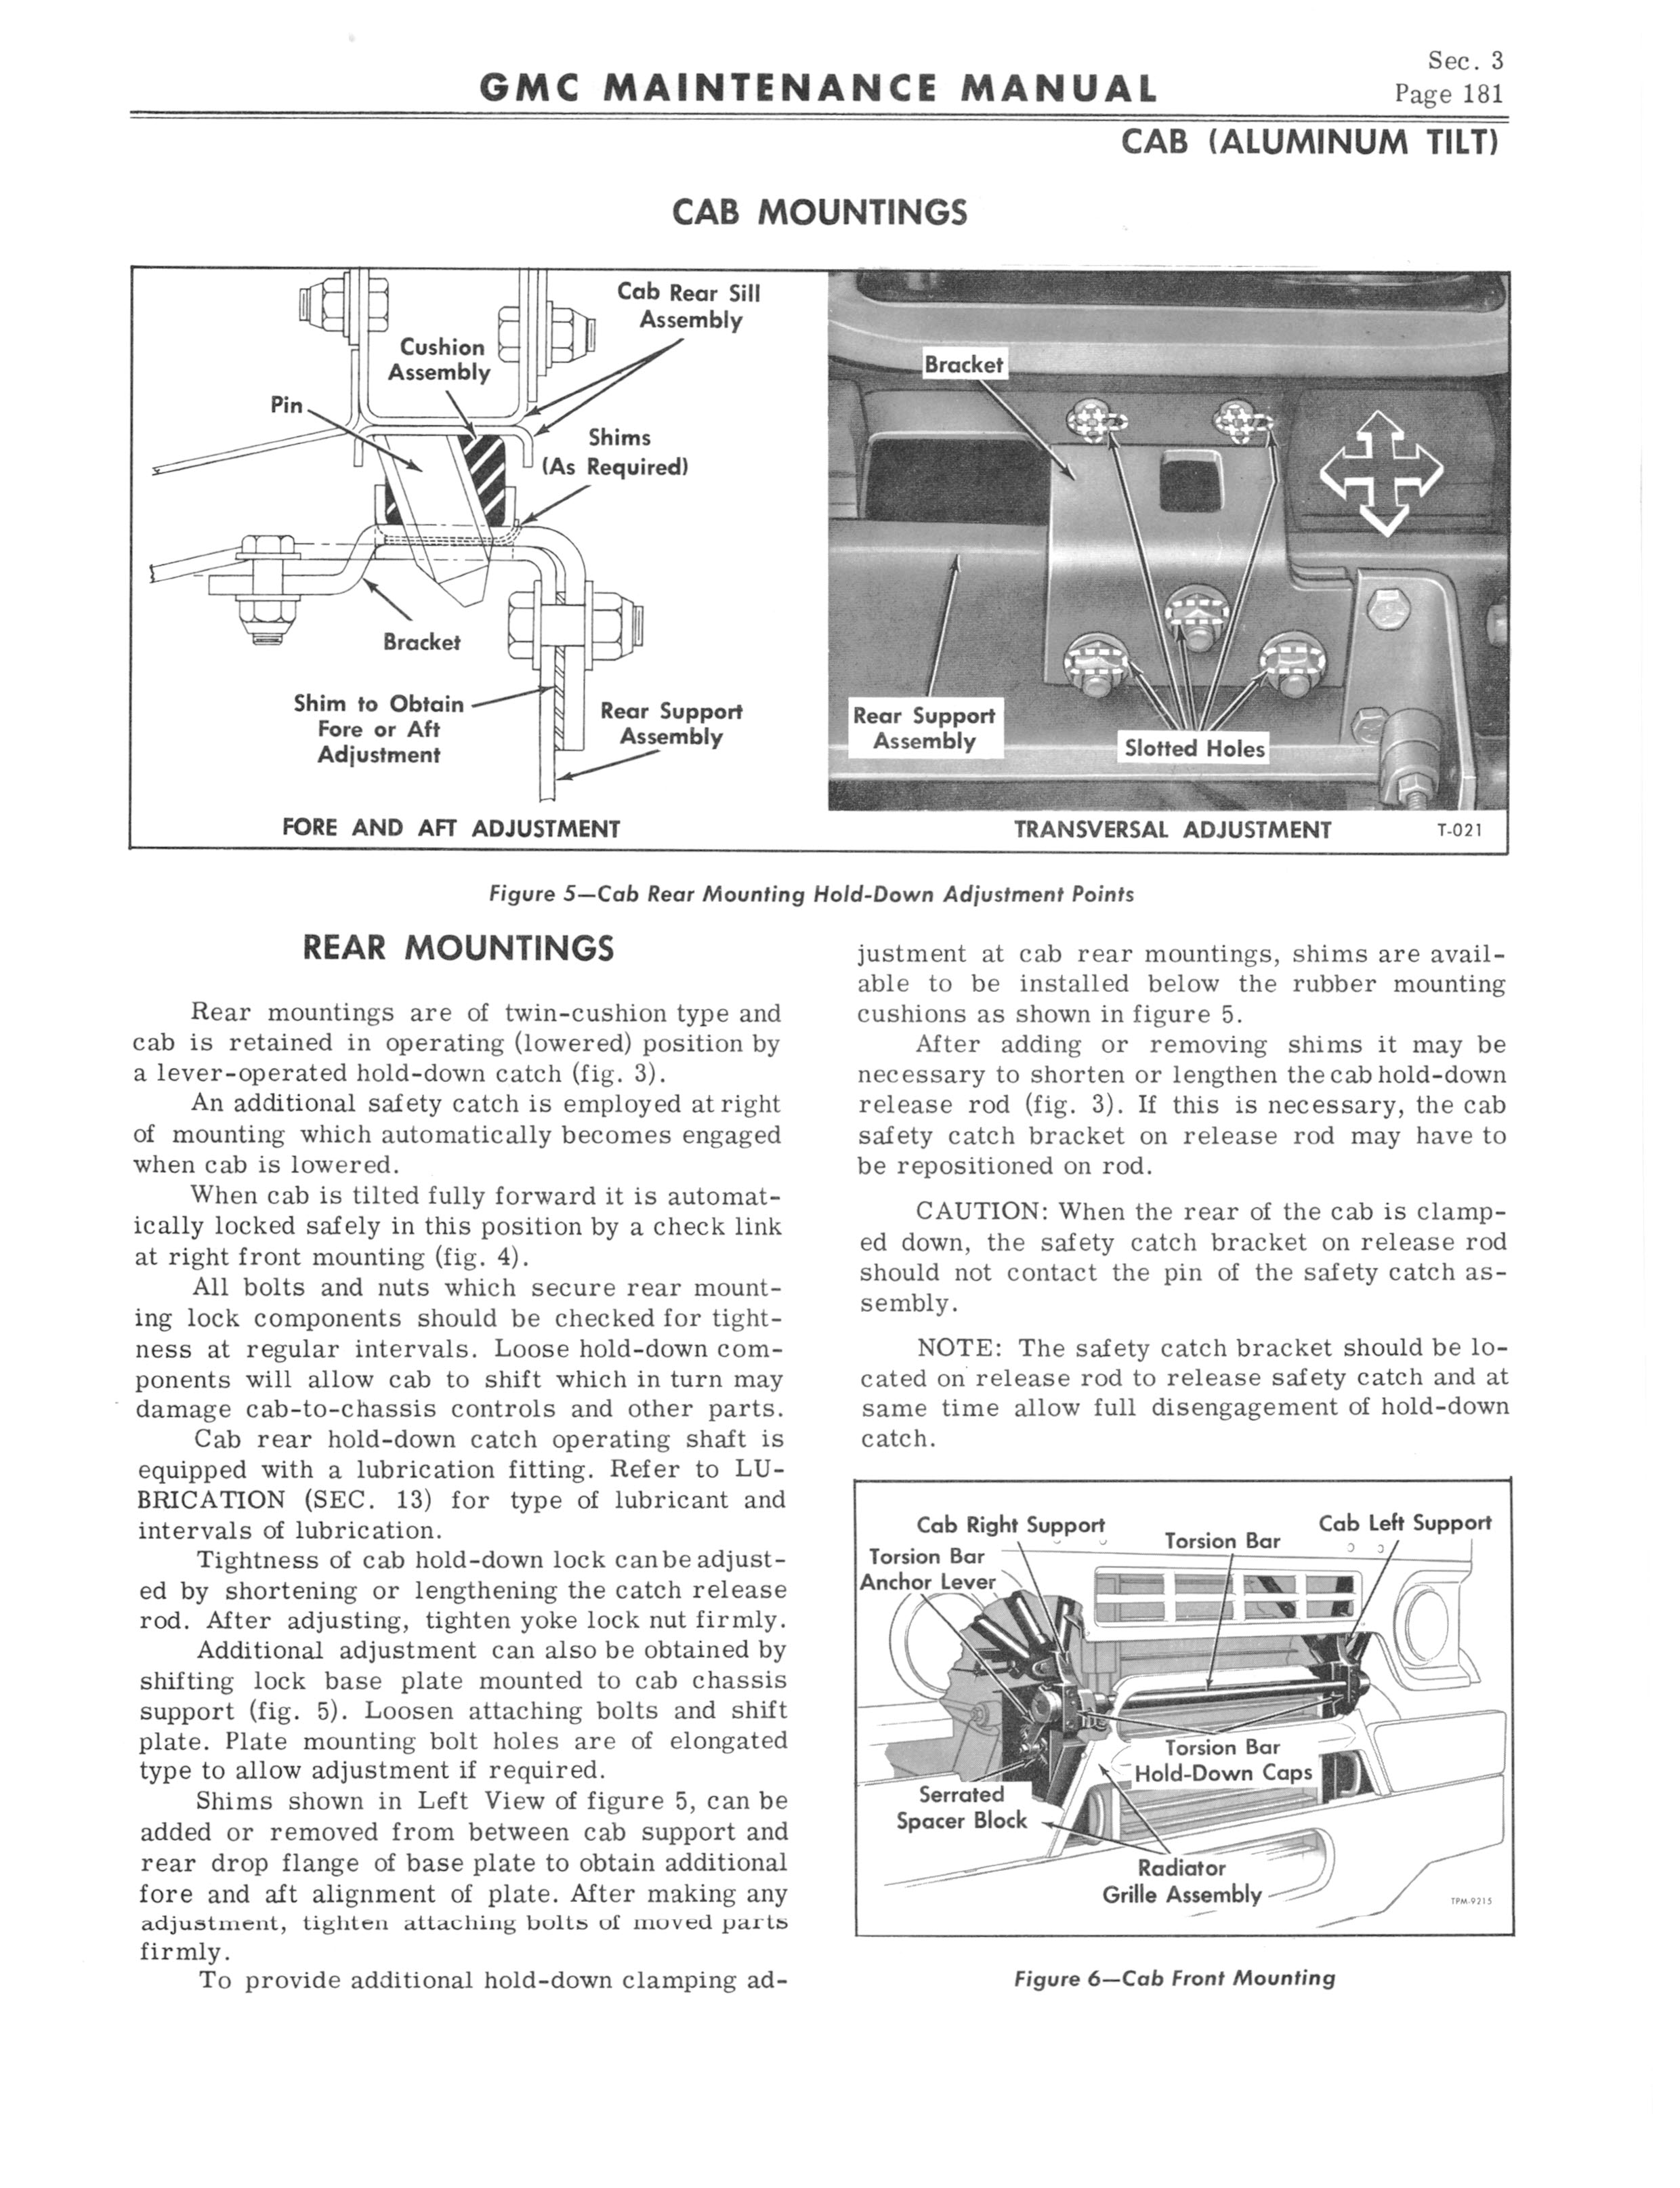 1964 GMC Series 5500-7100 Maintenance Manual page 189 of 834